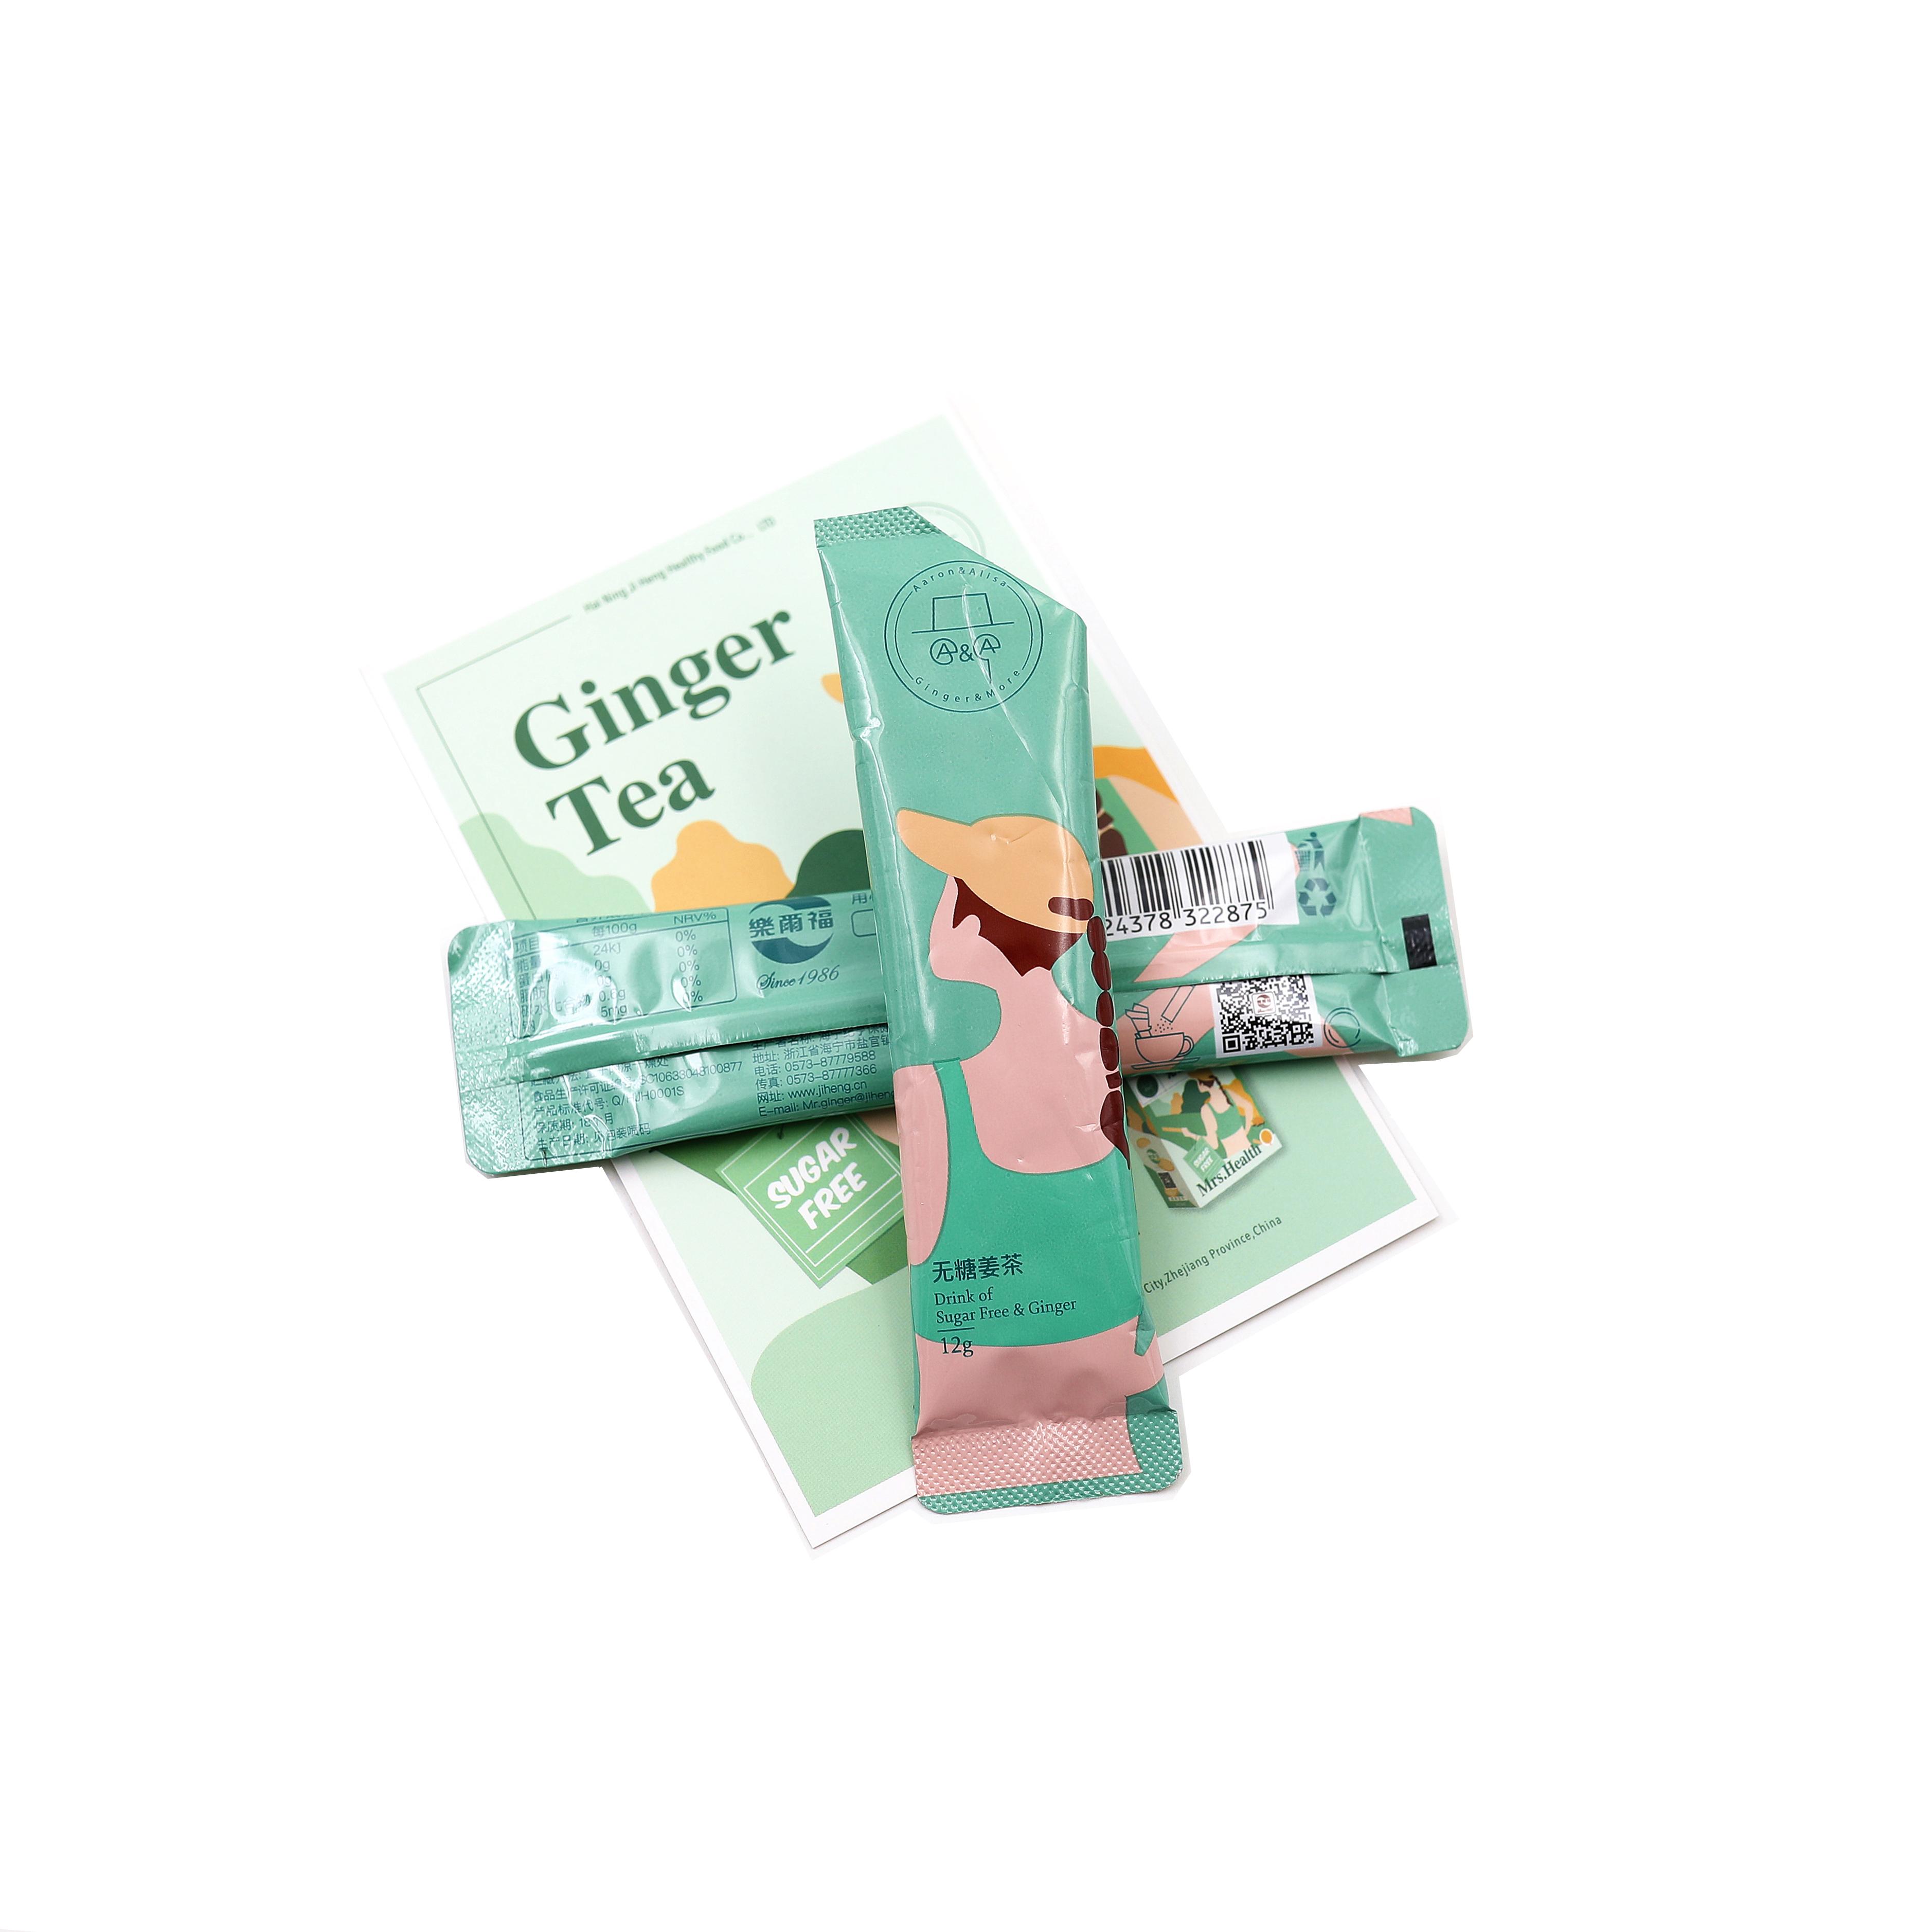 easy slim tea of beauty drink tea pack box sugar free ginger extract tea wholesale - 4uTea | 4uTea.com